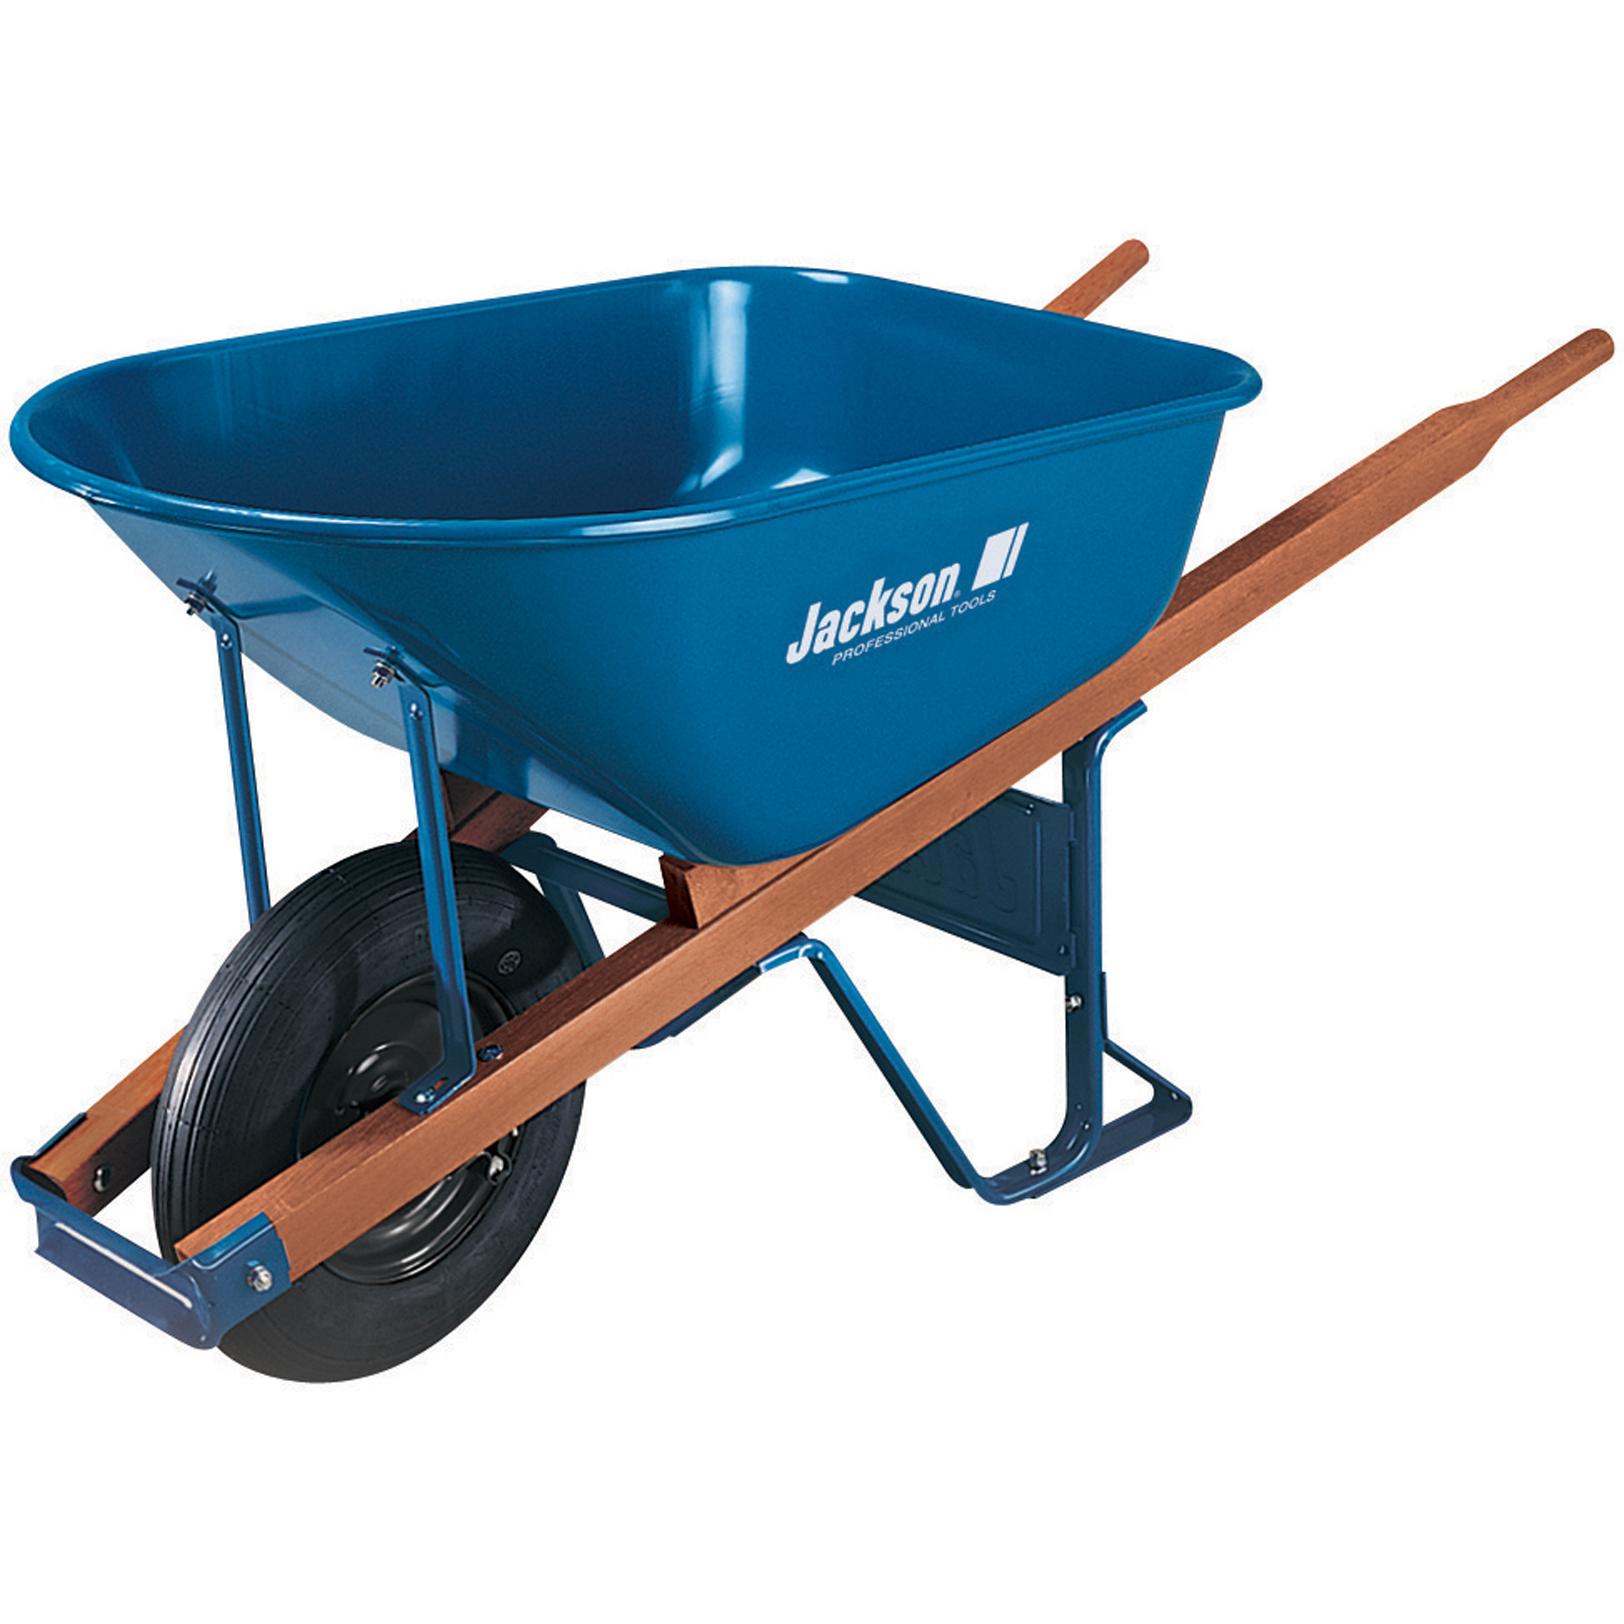 Ames Jackson 6cf Contractor Blue Steel Wheelbarrow Lawn Garden